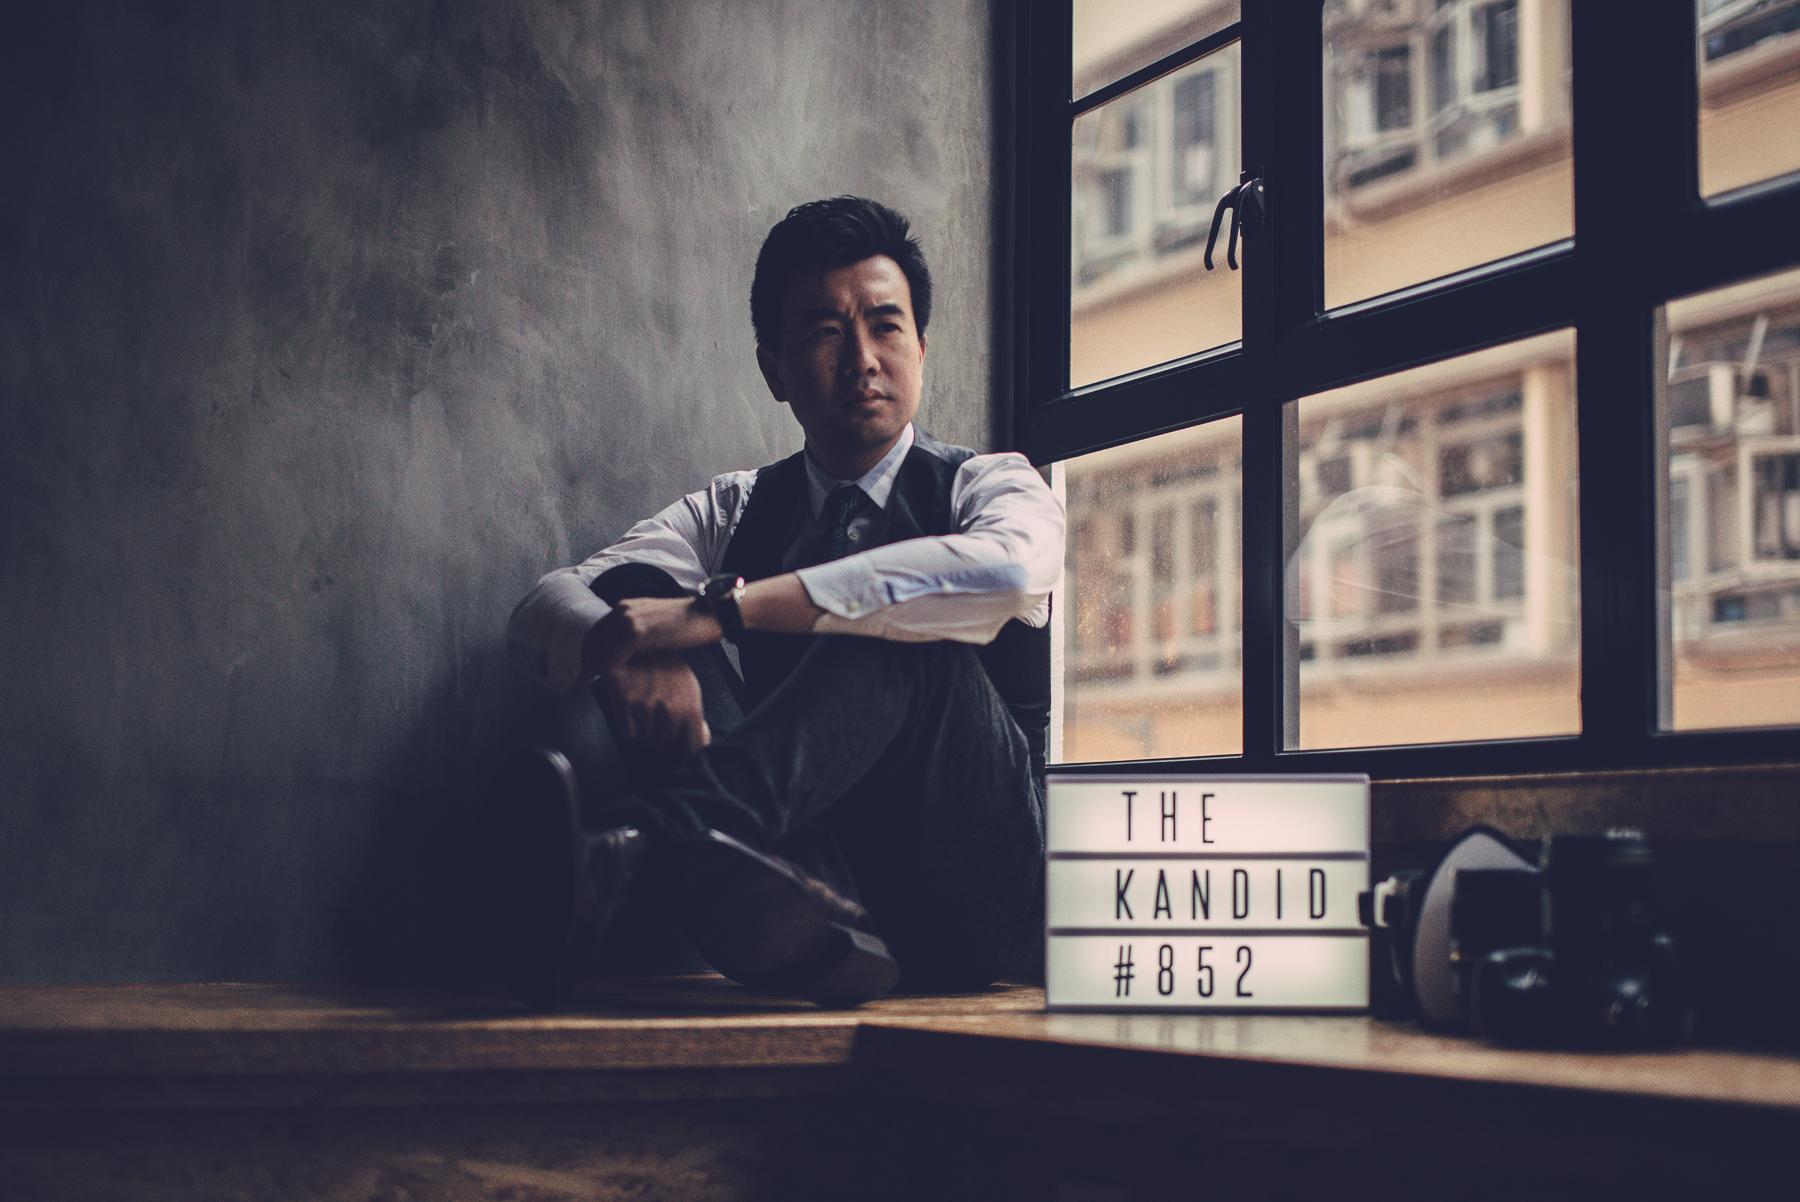 Justin Lim, self-portrait at The Kandid, 2015